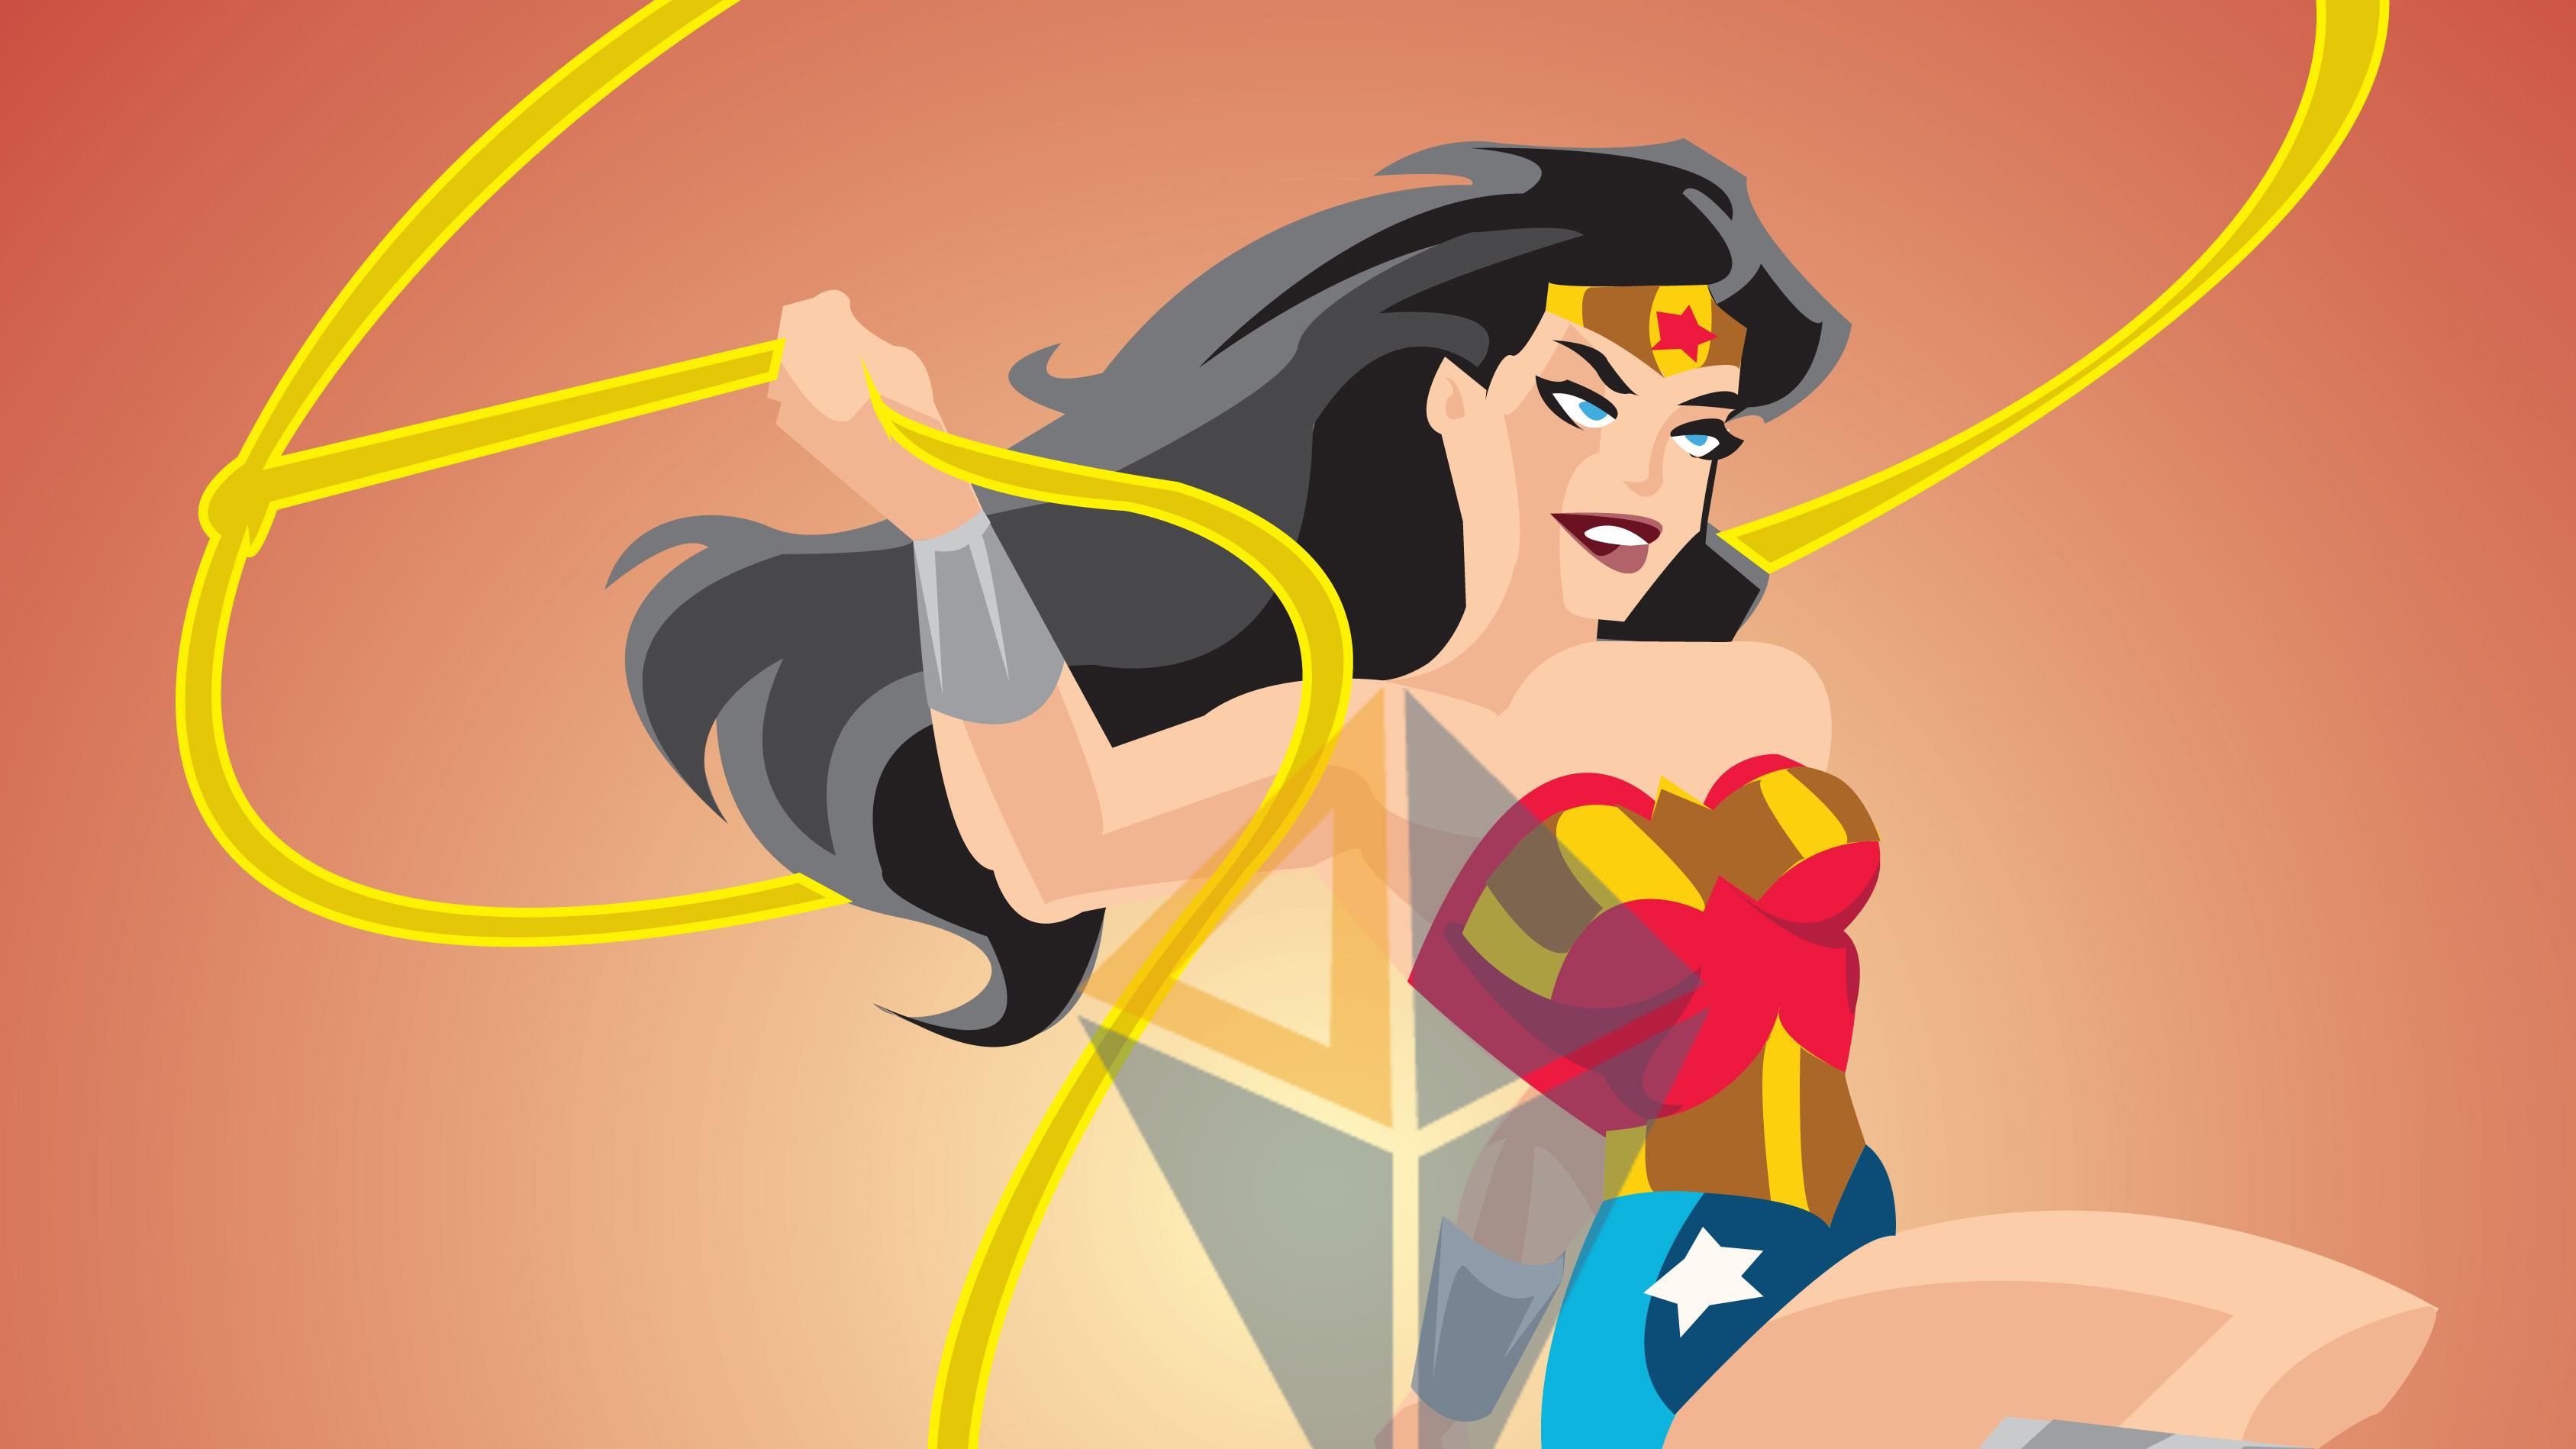 3375x1898 Wonder Woman Vector Art 4k Hdwpsite